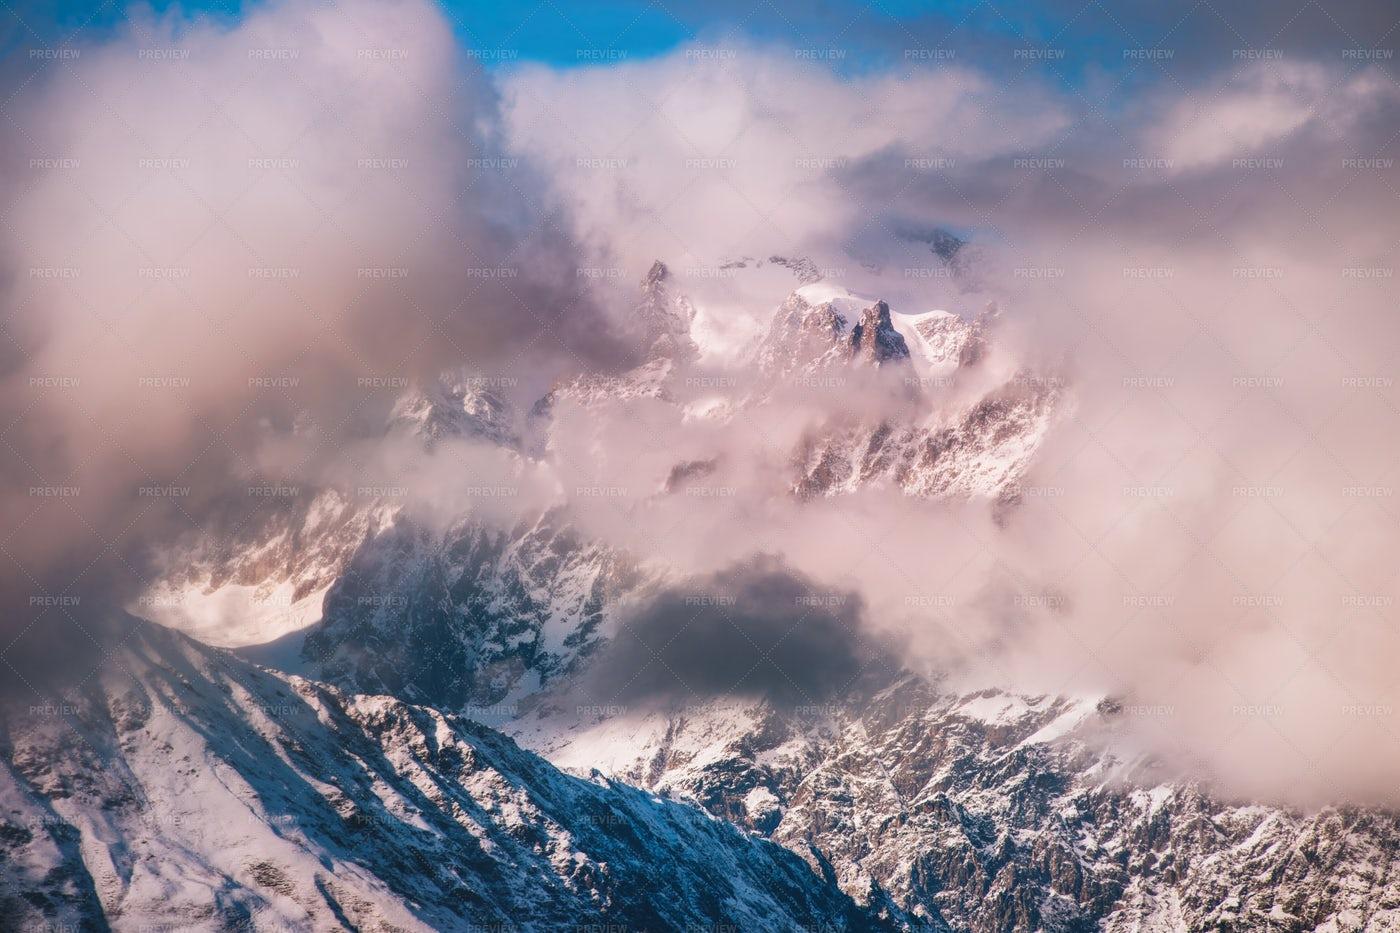 Clouds Blanket Caucasus Mountains: Stock Photos